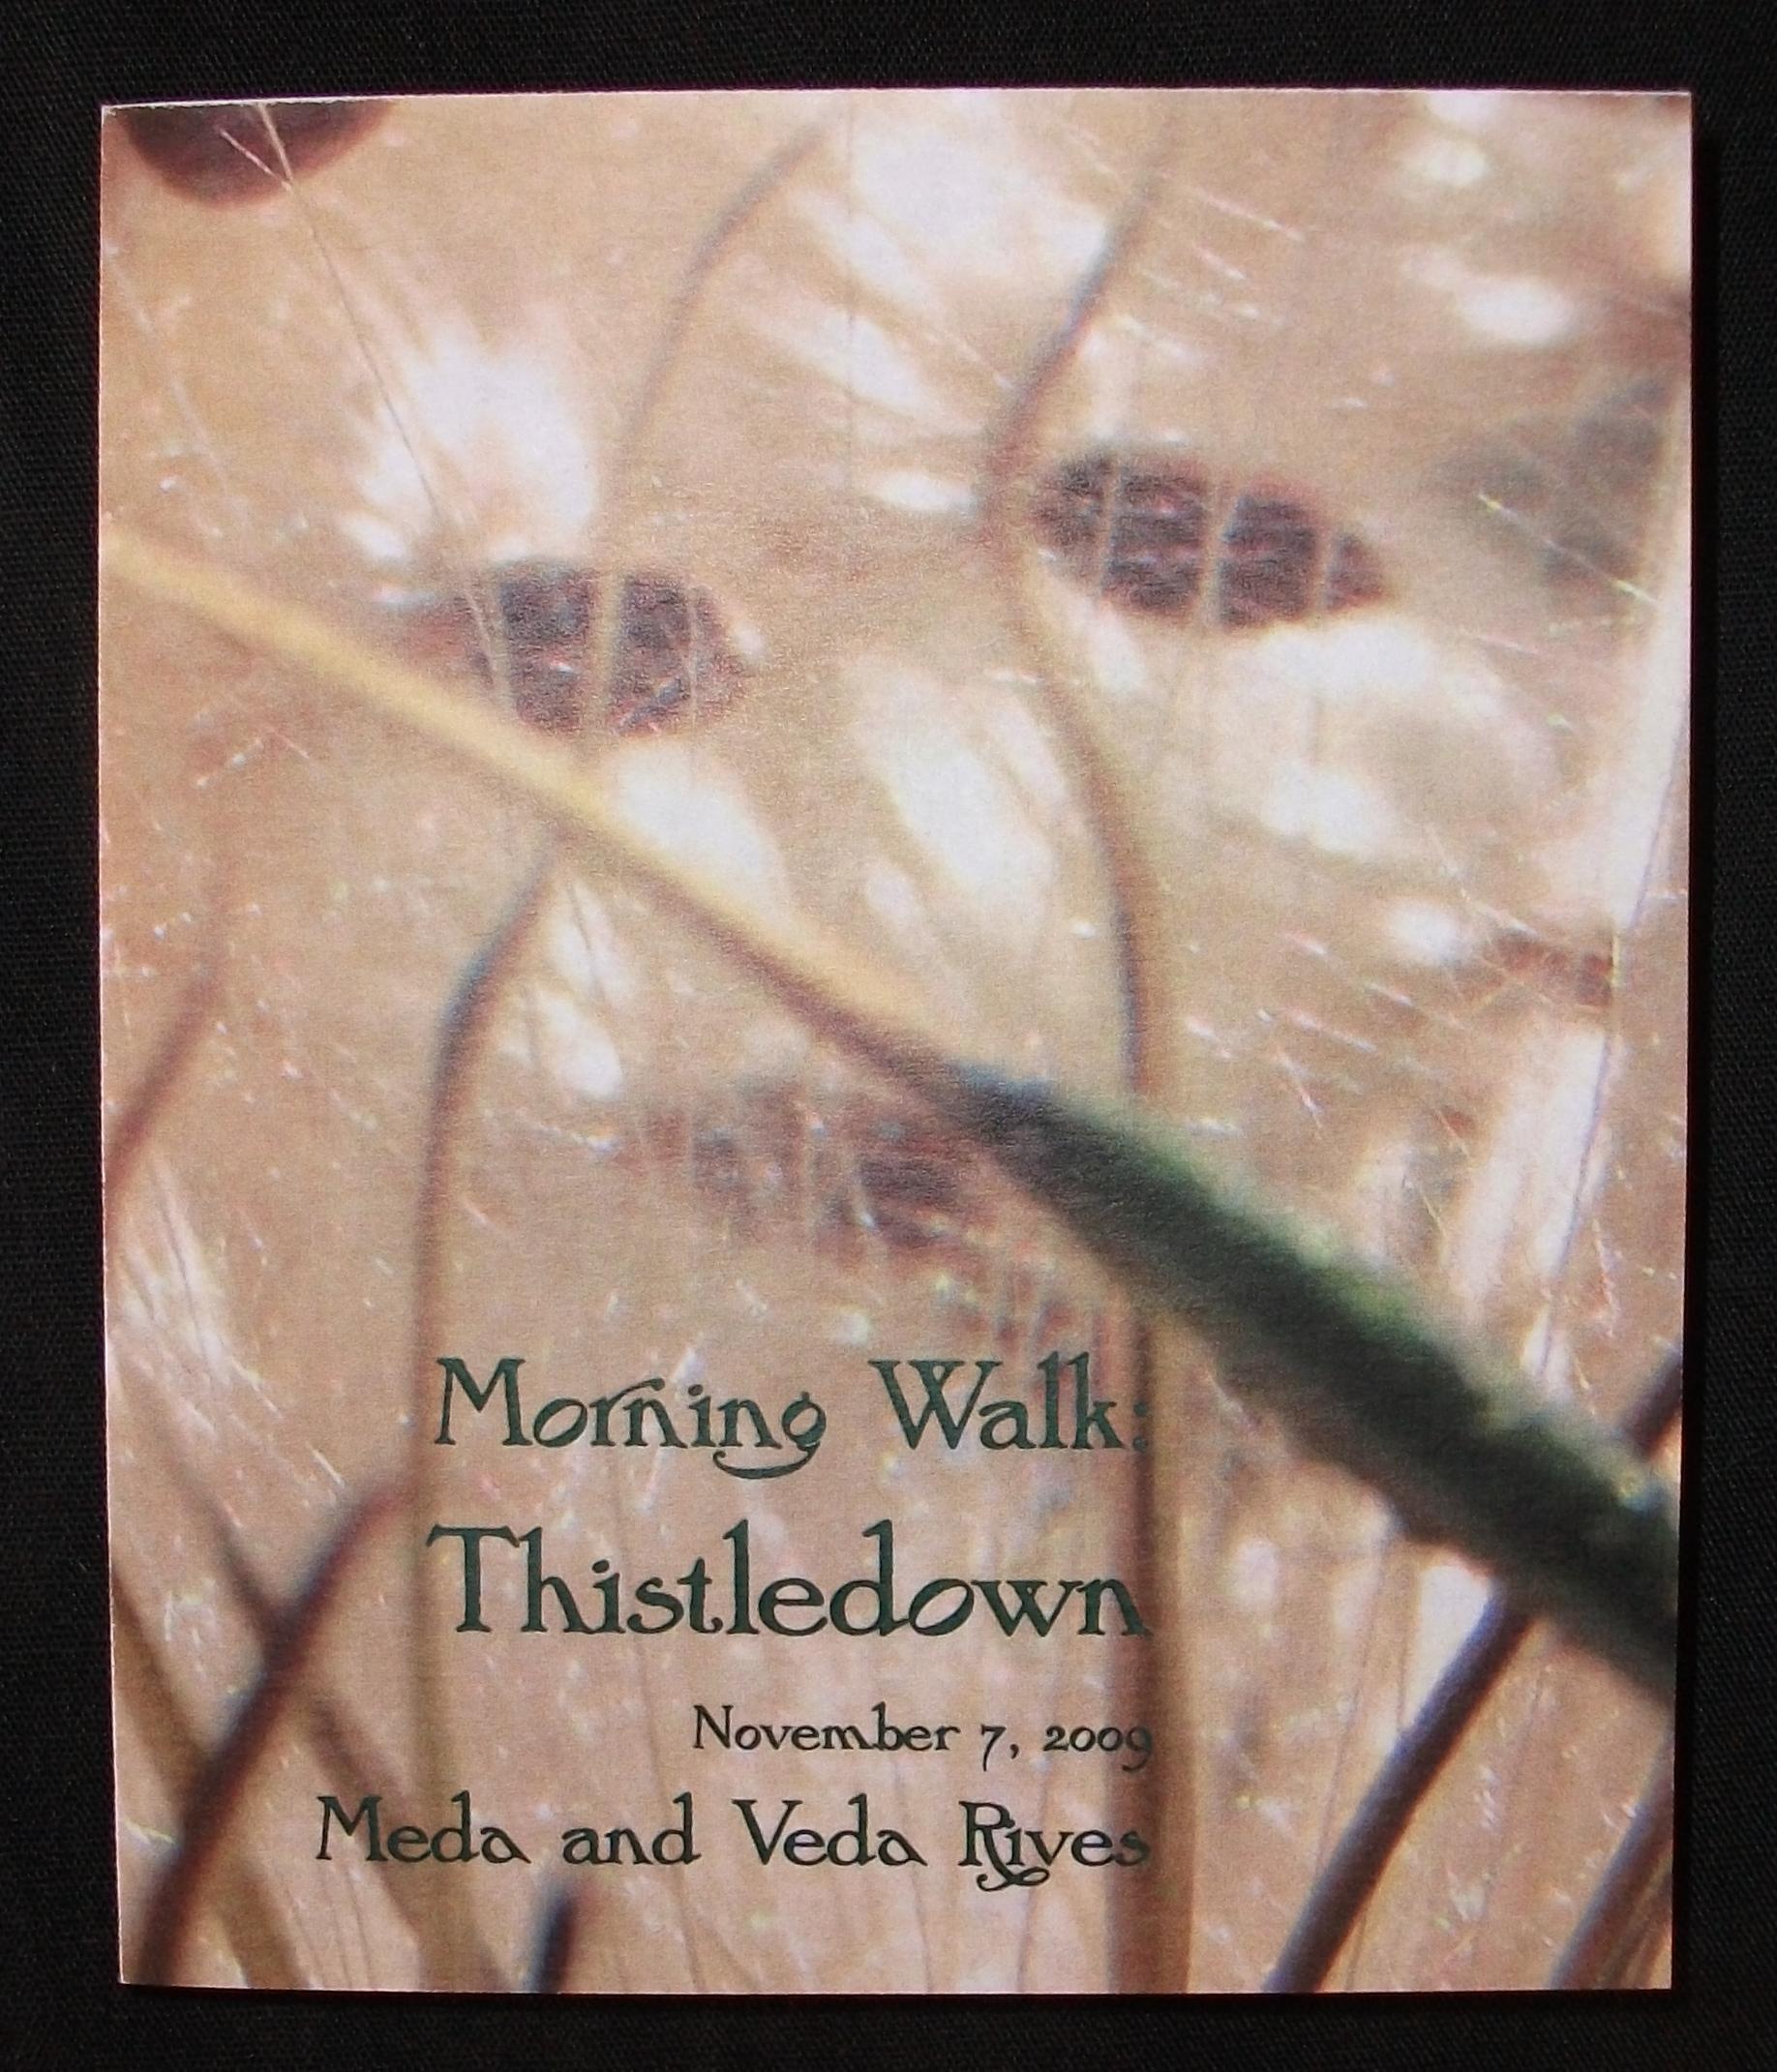 Veda Rives and Meda Rives, Morning Walk: Thistledown, Digital, 2009-2010